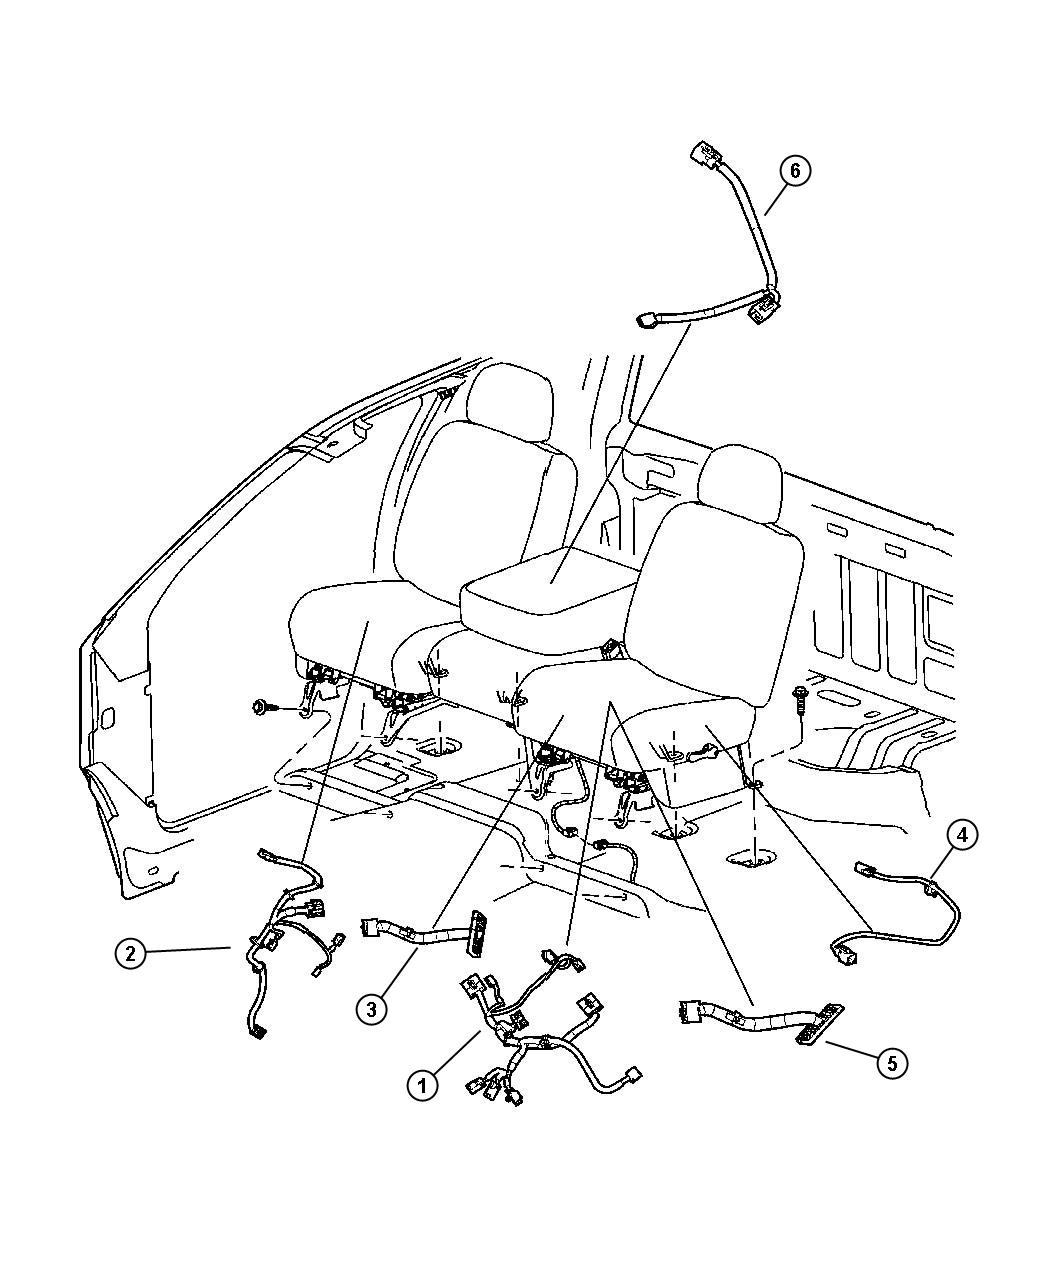 2007 dodge ram power seat wiring diagram about wiring diagram